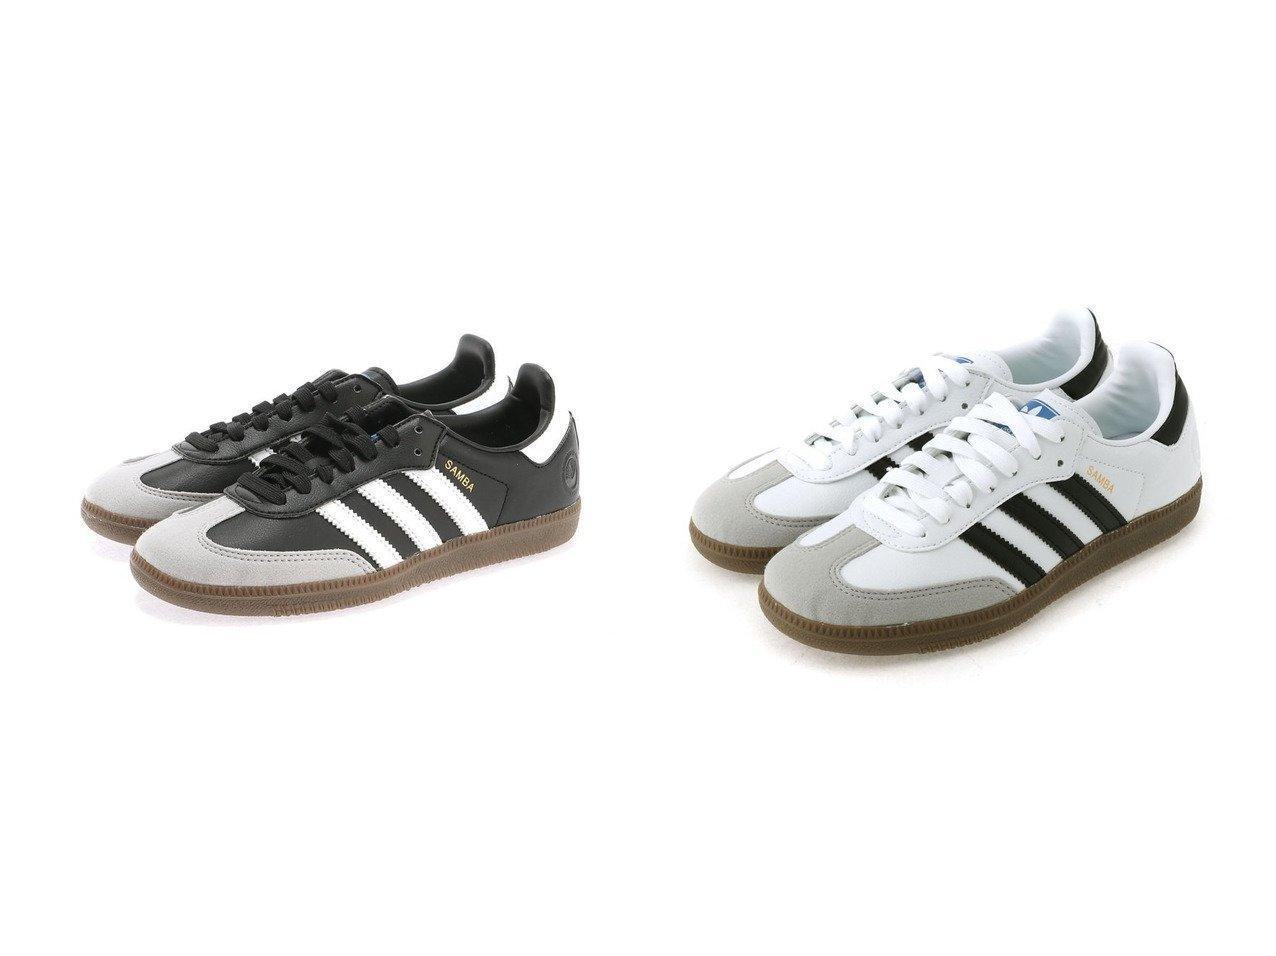 【adidas Originals/アディダス オリジナルス】のサンバ ヴィーガン SAMBA VEGAN アディダスオリジナルス adidasのおすすめ!人気、トレンド・レディースファッションの通販  おすすめで人気の流行・トレンド、ファッションの通販商品 メンズファッション・キッズファッション・インテリア・家具・レディースファッション・服の通販 founy(ファニー) https://founy.com/ ファッション Fashion レディースファッション WOMEN コーティング サッカー シューズ スニーカー スリッポン ライニング 再入荷 Restock/Back in Stock/Re Arrival  ID:crp329100000020208